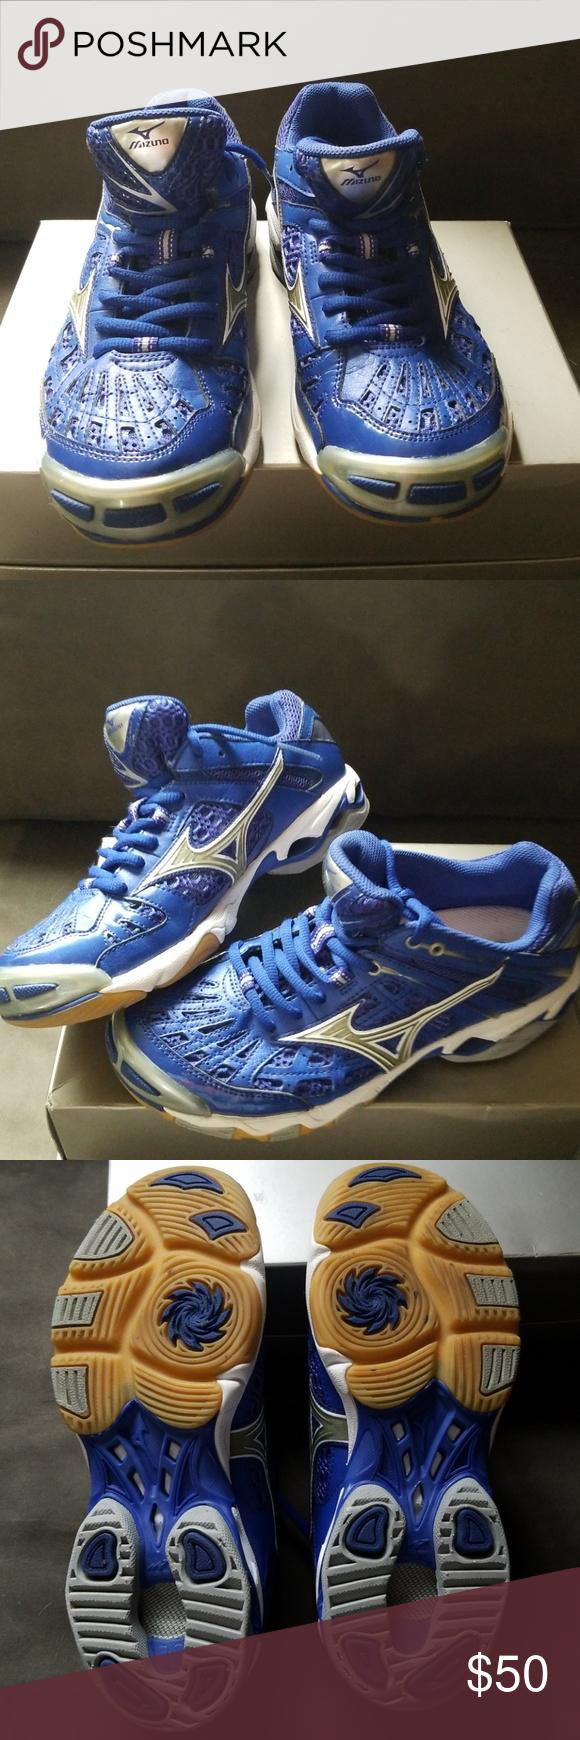 Mizuno Volleyball Shoes Volleyball Shoes Mizuno Shoes Mizuno